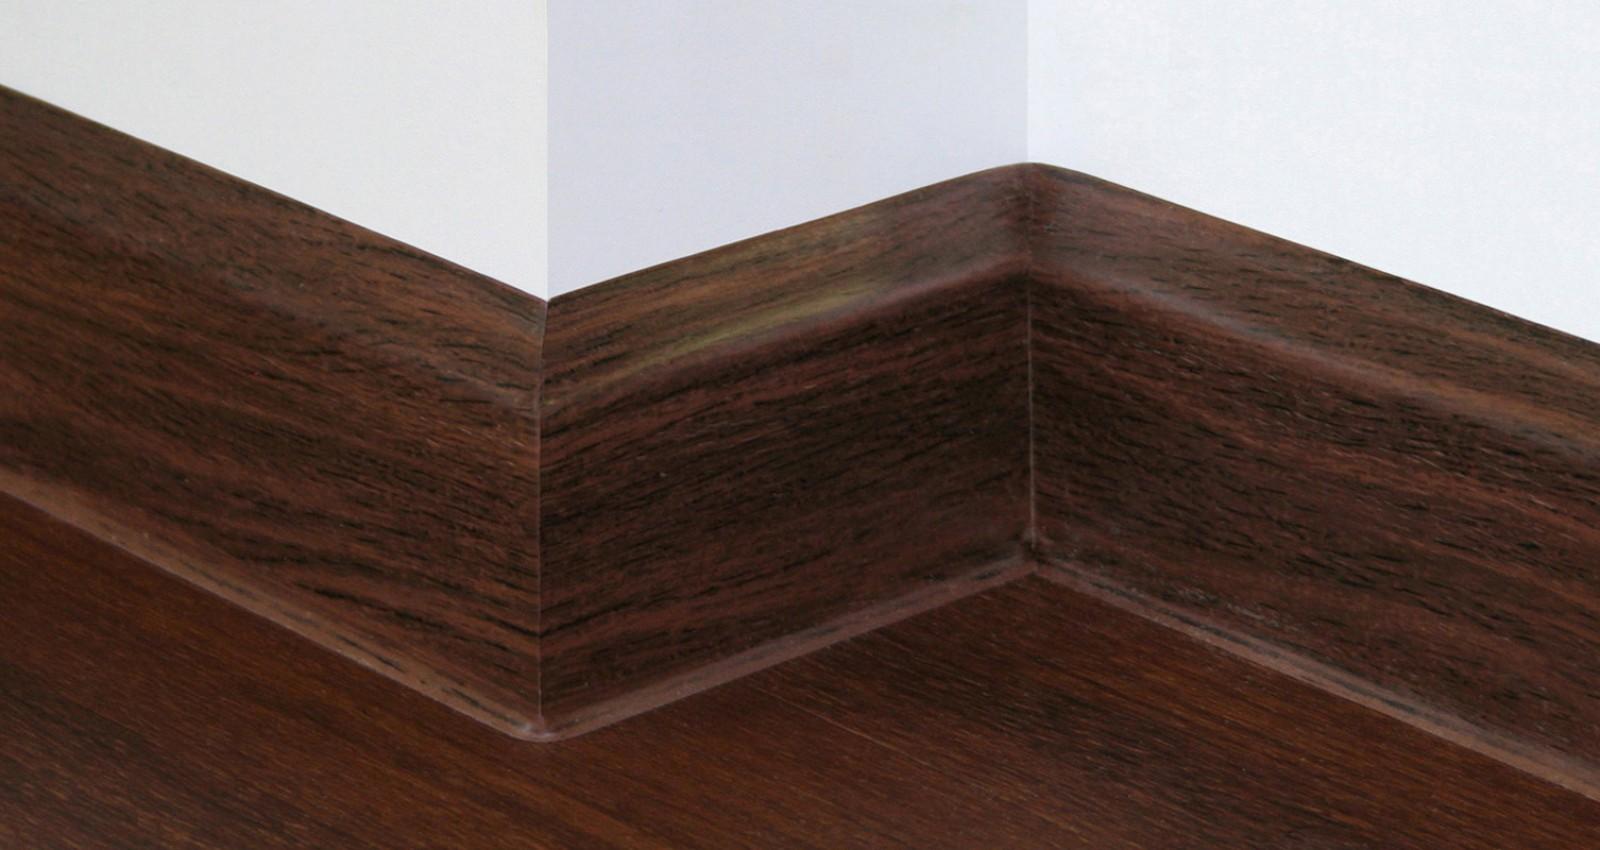 sockelleisten kunststoff kunststoff sockelleiste kubisch 80mm hoch versch sockelleisten. Black Bedroom Furniture Sets. Home Design Ideas